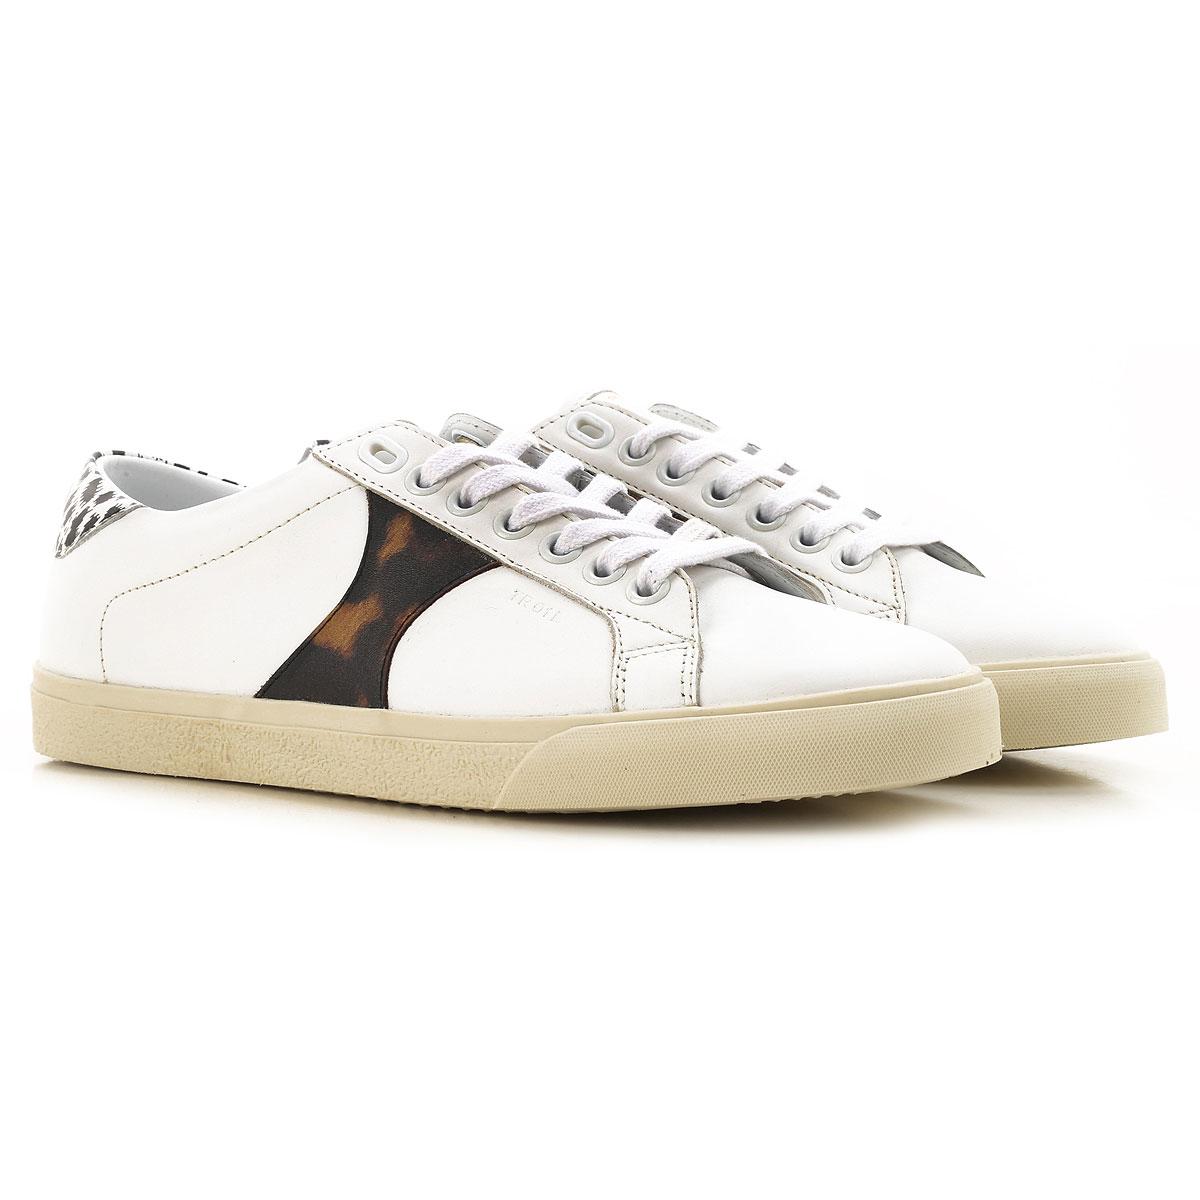 Celine Sneaker Femme Pas cher en Soldes Outlet, Blanc, Cuir, 2019, 38 39 40